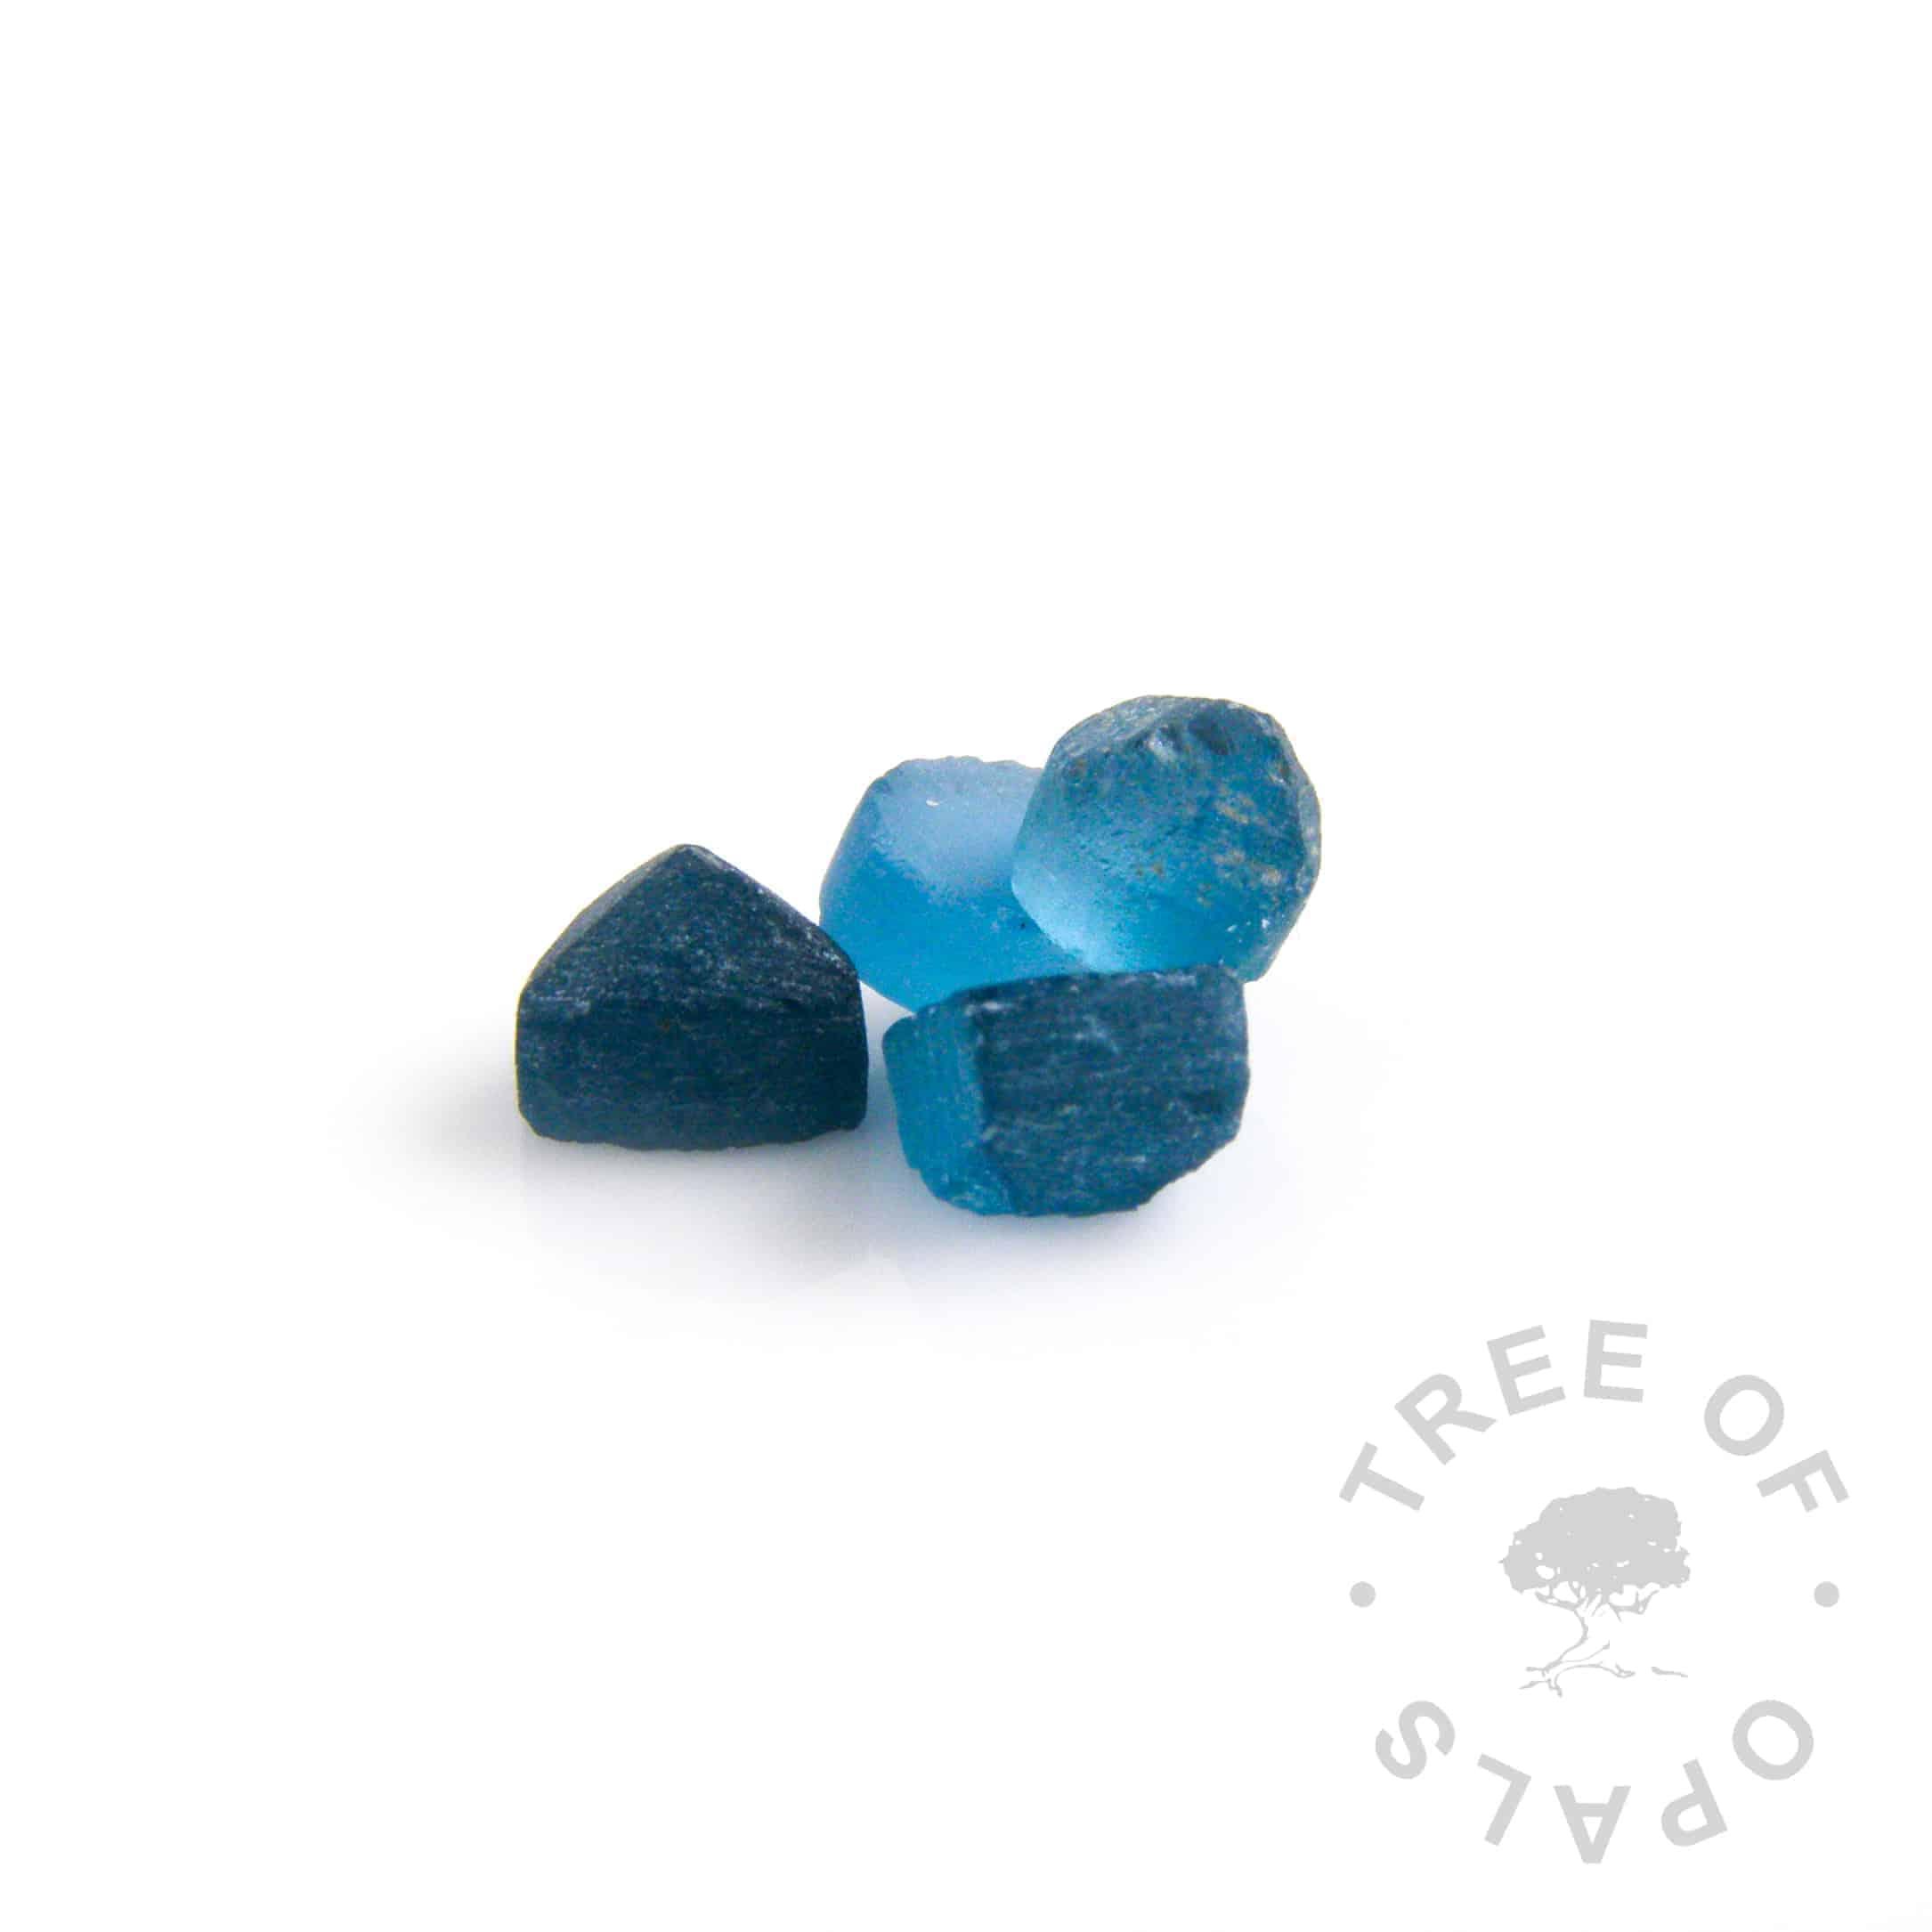 December birthstone blue topaz rough natural precious stone